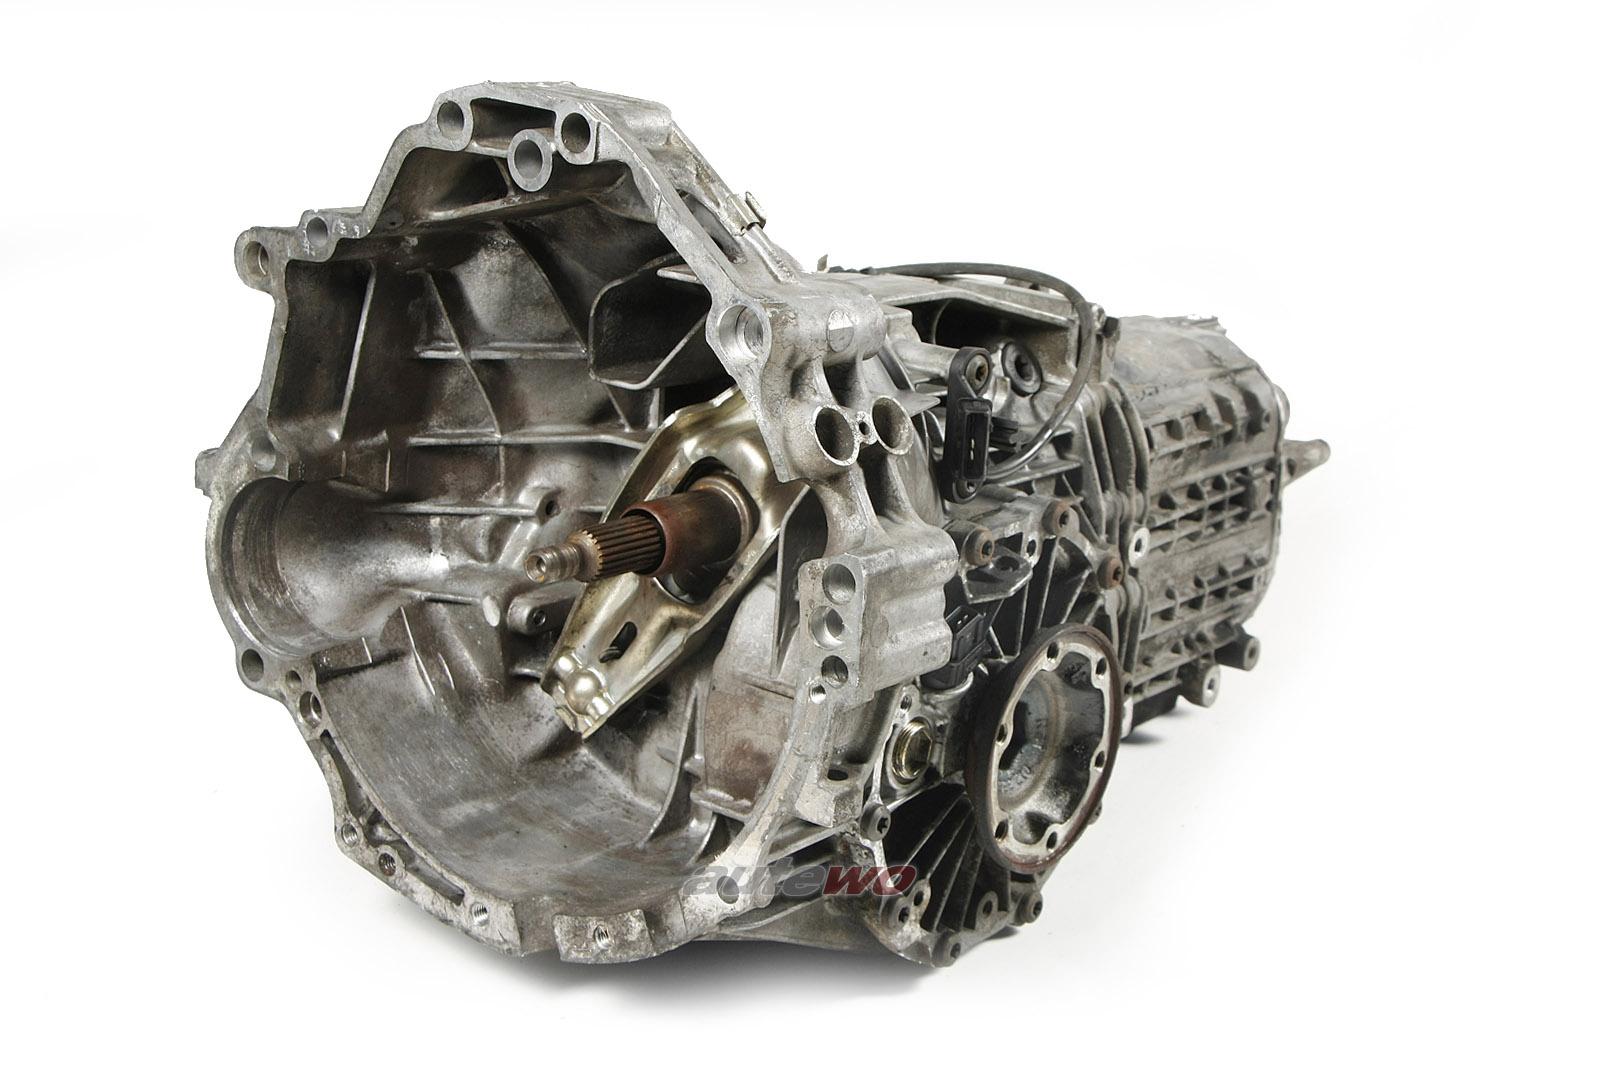 012300054KX Audi 80 Typ 89 Cabrio/A4 B5/A6 4B 1.8l Getriebe 5-Gang DWA 11118